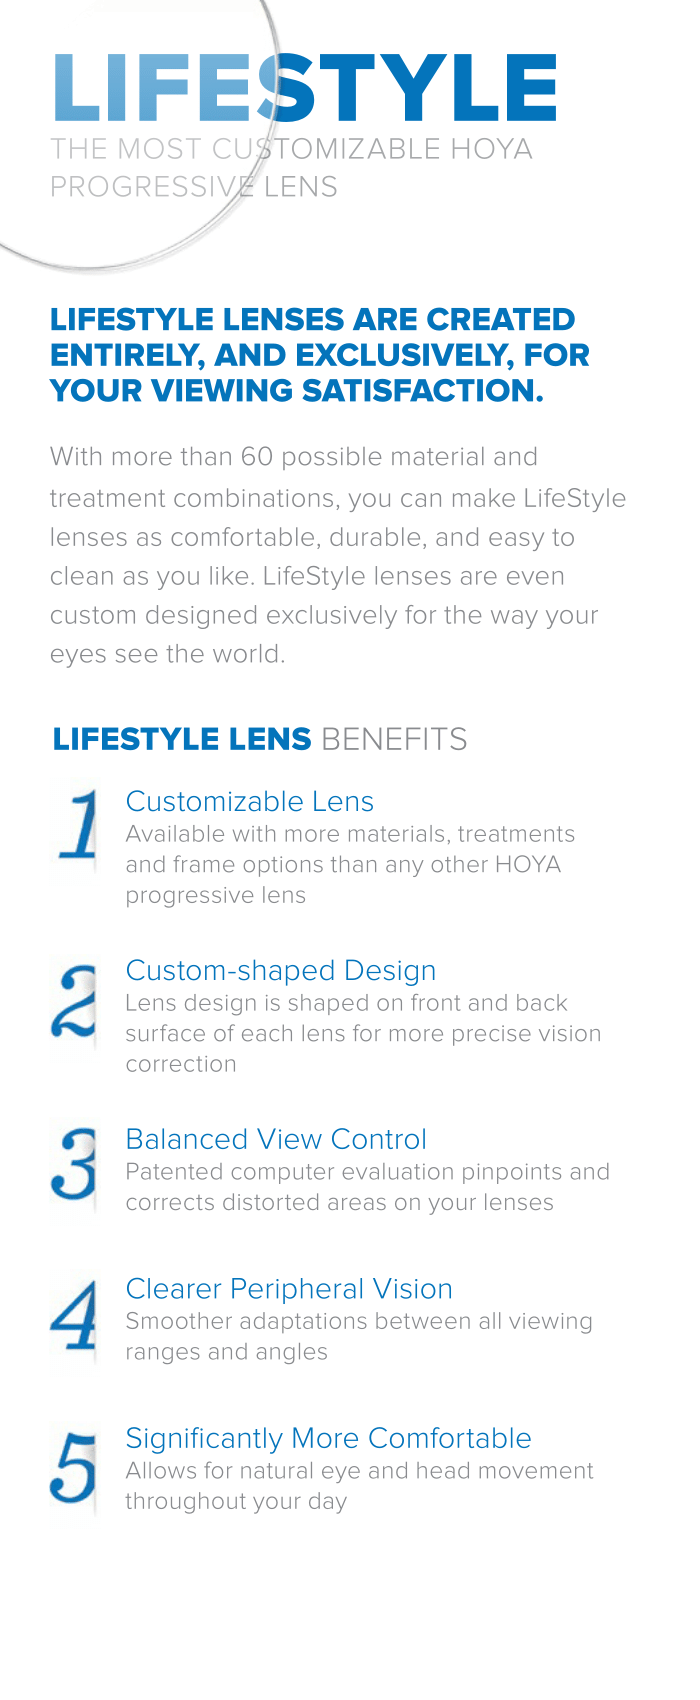 iD LifeStyle 2 HOYA progressive lens